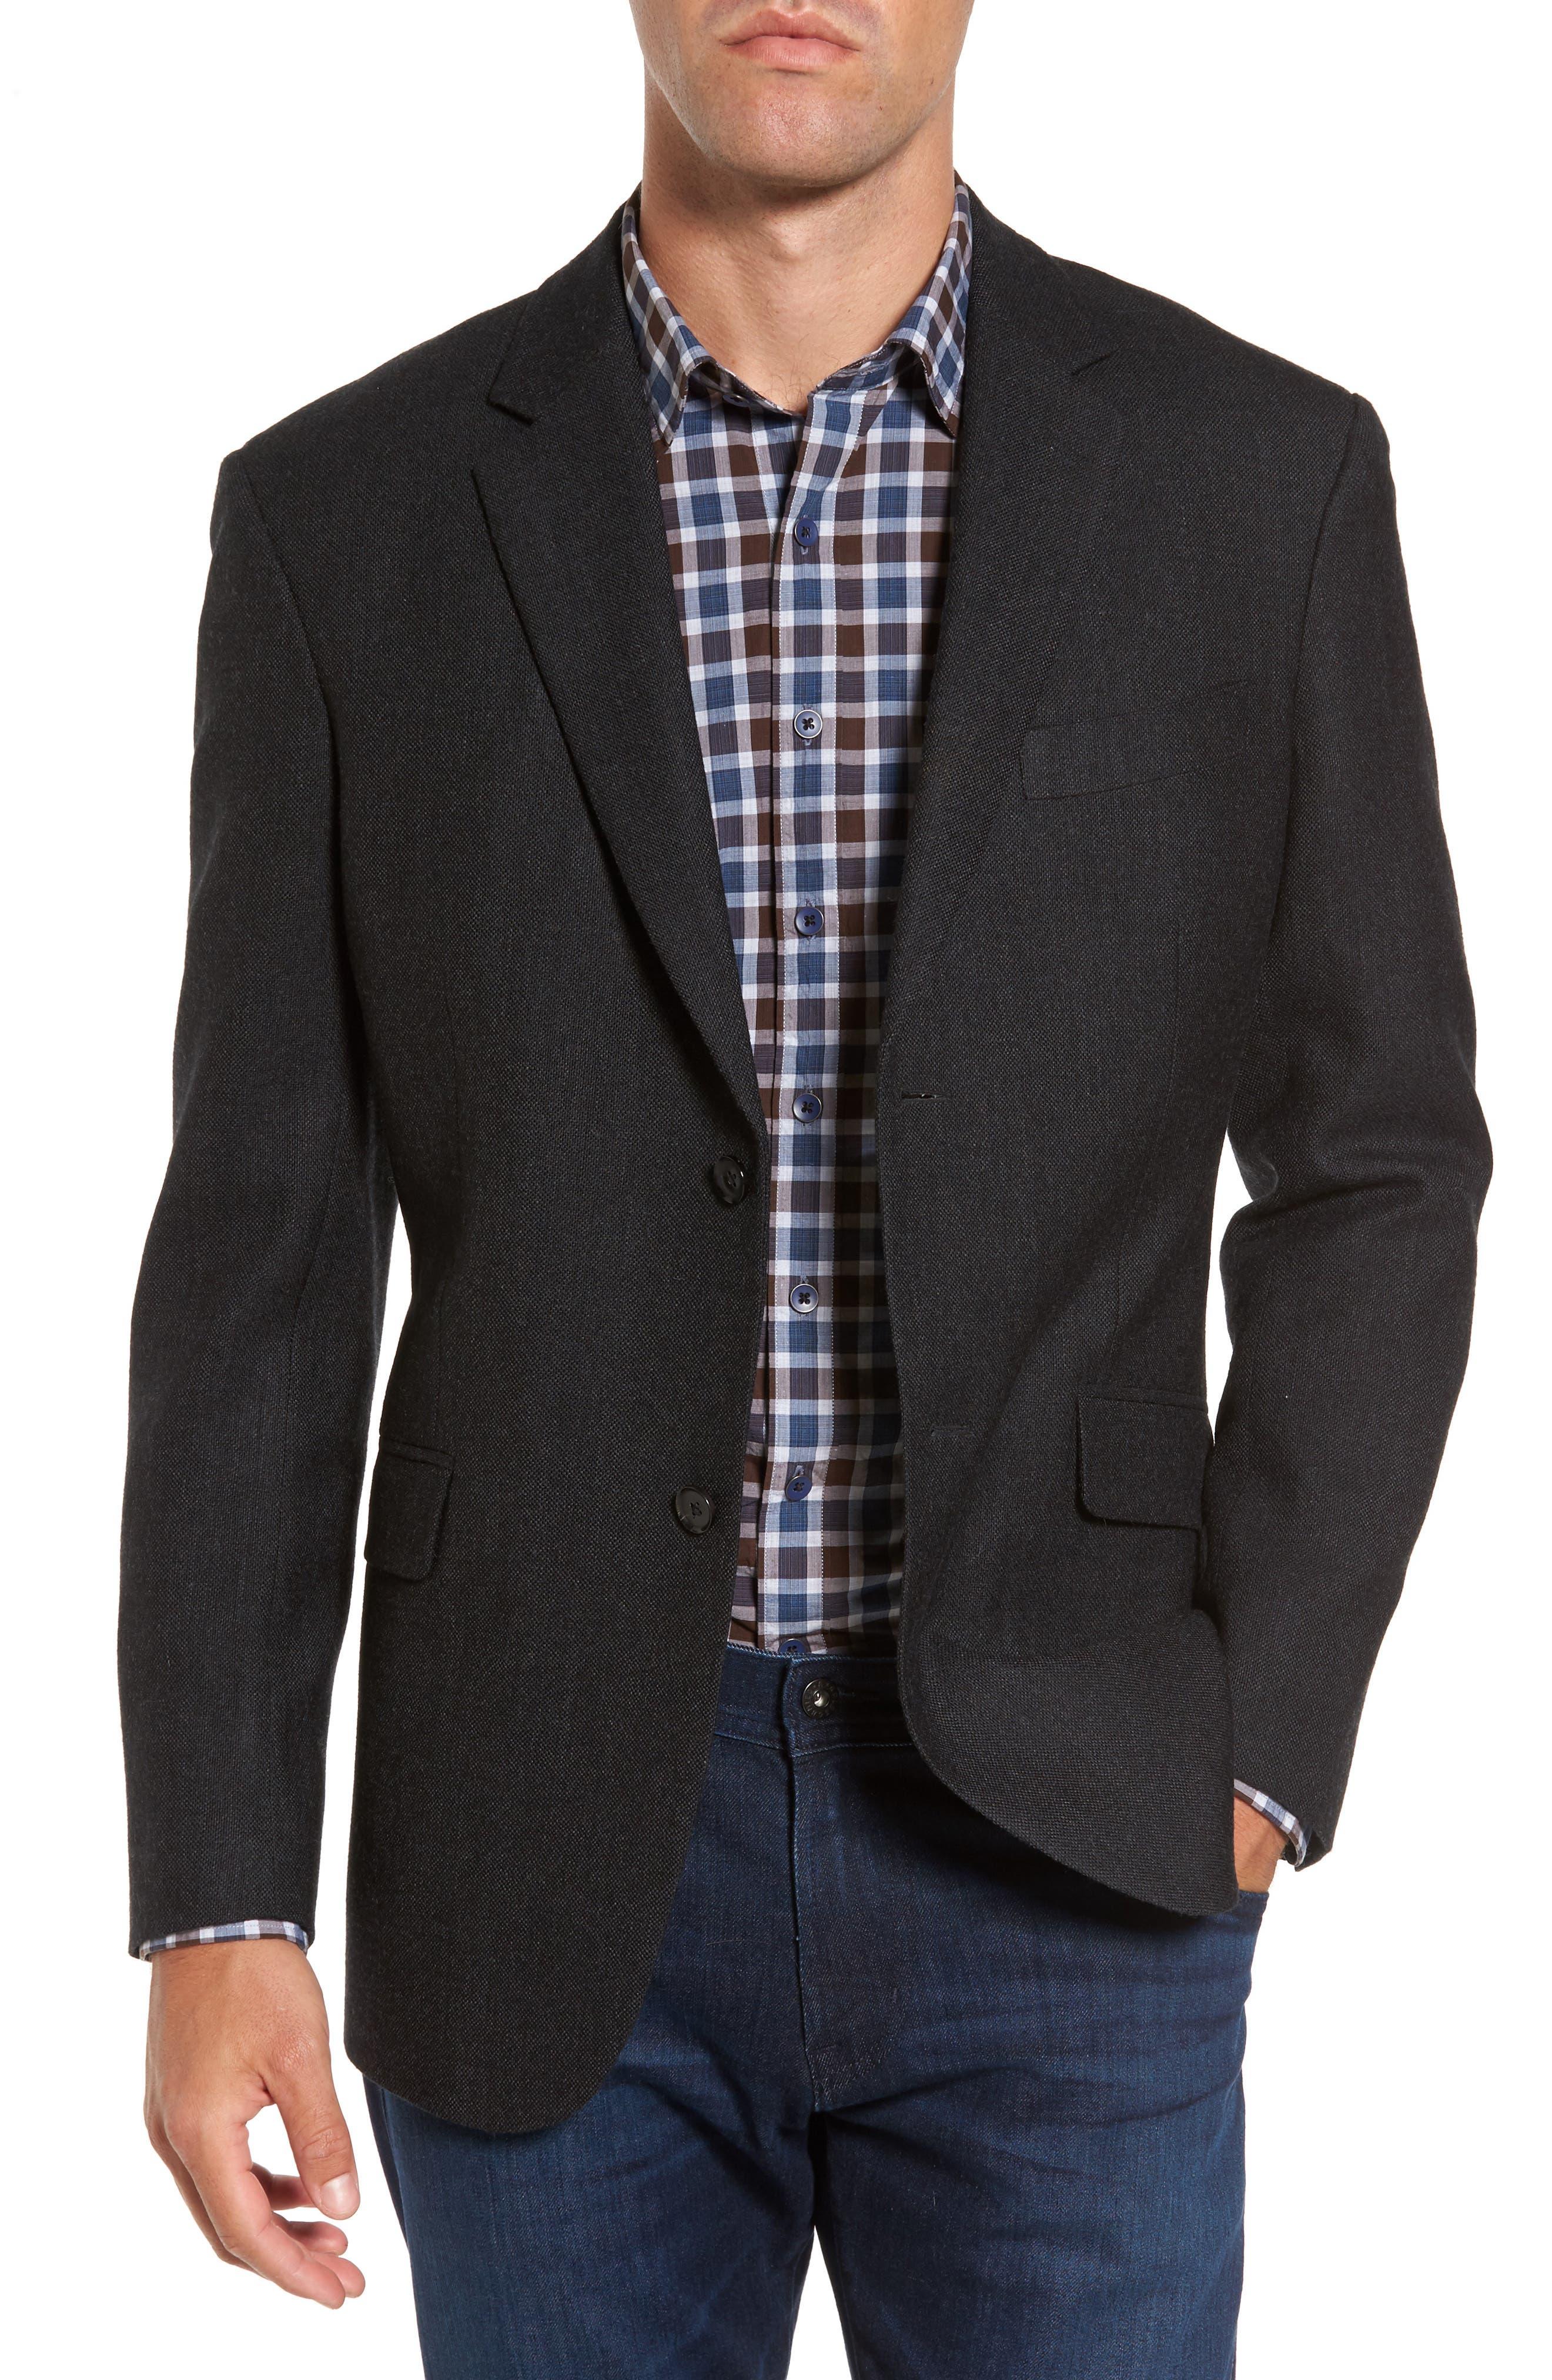 Main Image - Rodd & Gunn Slingsby Virgin Wool Sport Coat